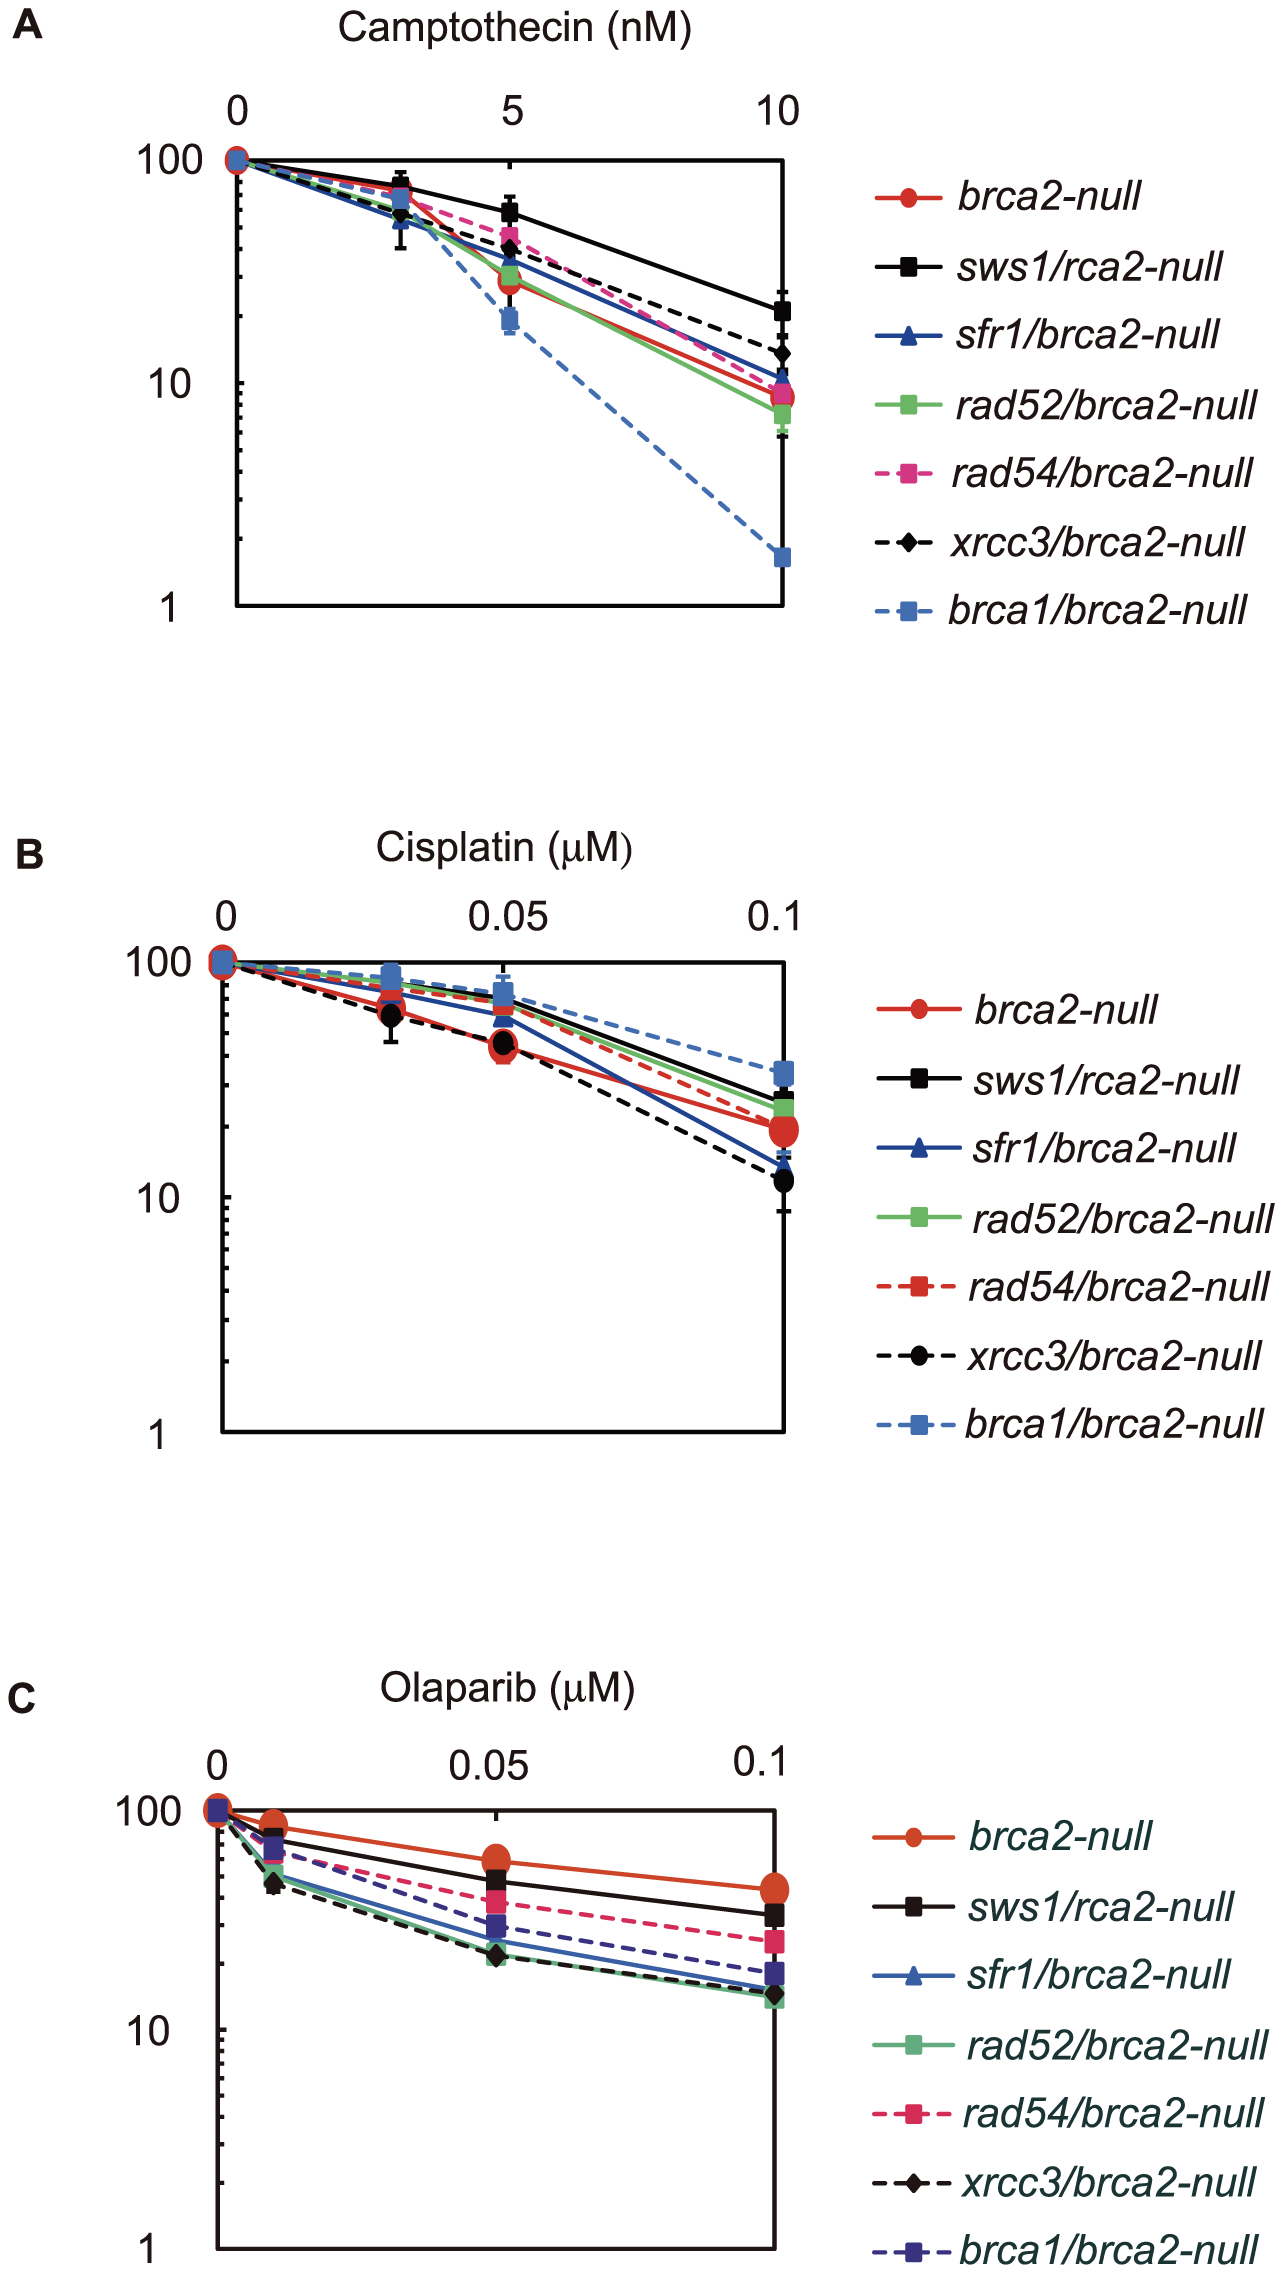 Effect of <i>brca2</i> deletion on <i>sws1-</i>, <i>sfr1-</i>, <i>rad52-</i>, <i>rad54-</i>, <i>xrcc3-</i>, and <i>brca1-</i>deficient cells.